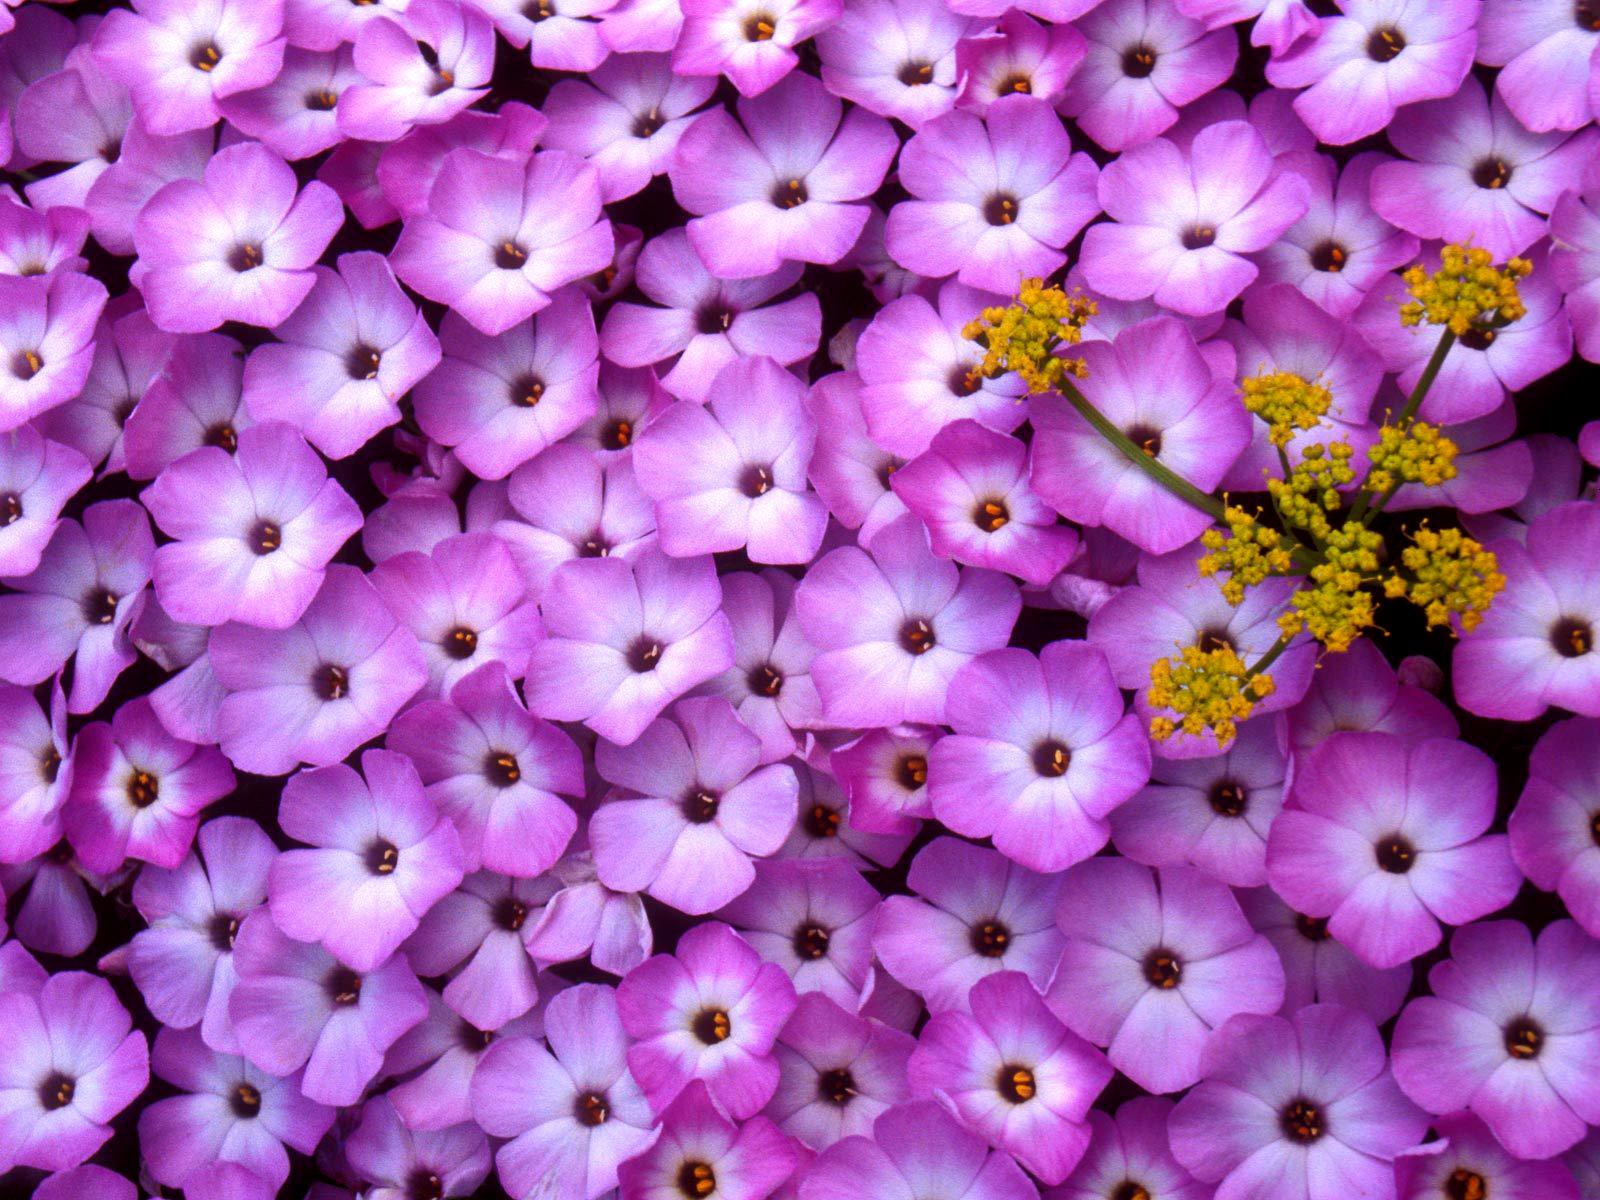 http://2.bp.blogspot.com/-sohjYfvvv3c/UGaAxTXWrjI/AAAAAAAAAIw/Infw9p5v_UQ/s1600/wallpaper-gambar-bunga-9.jpg